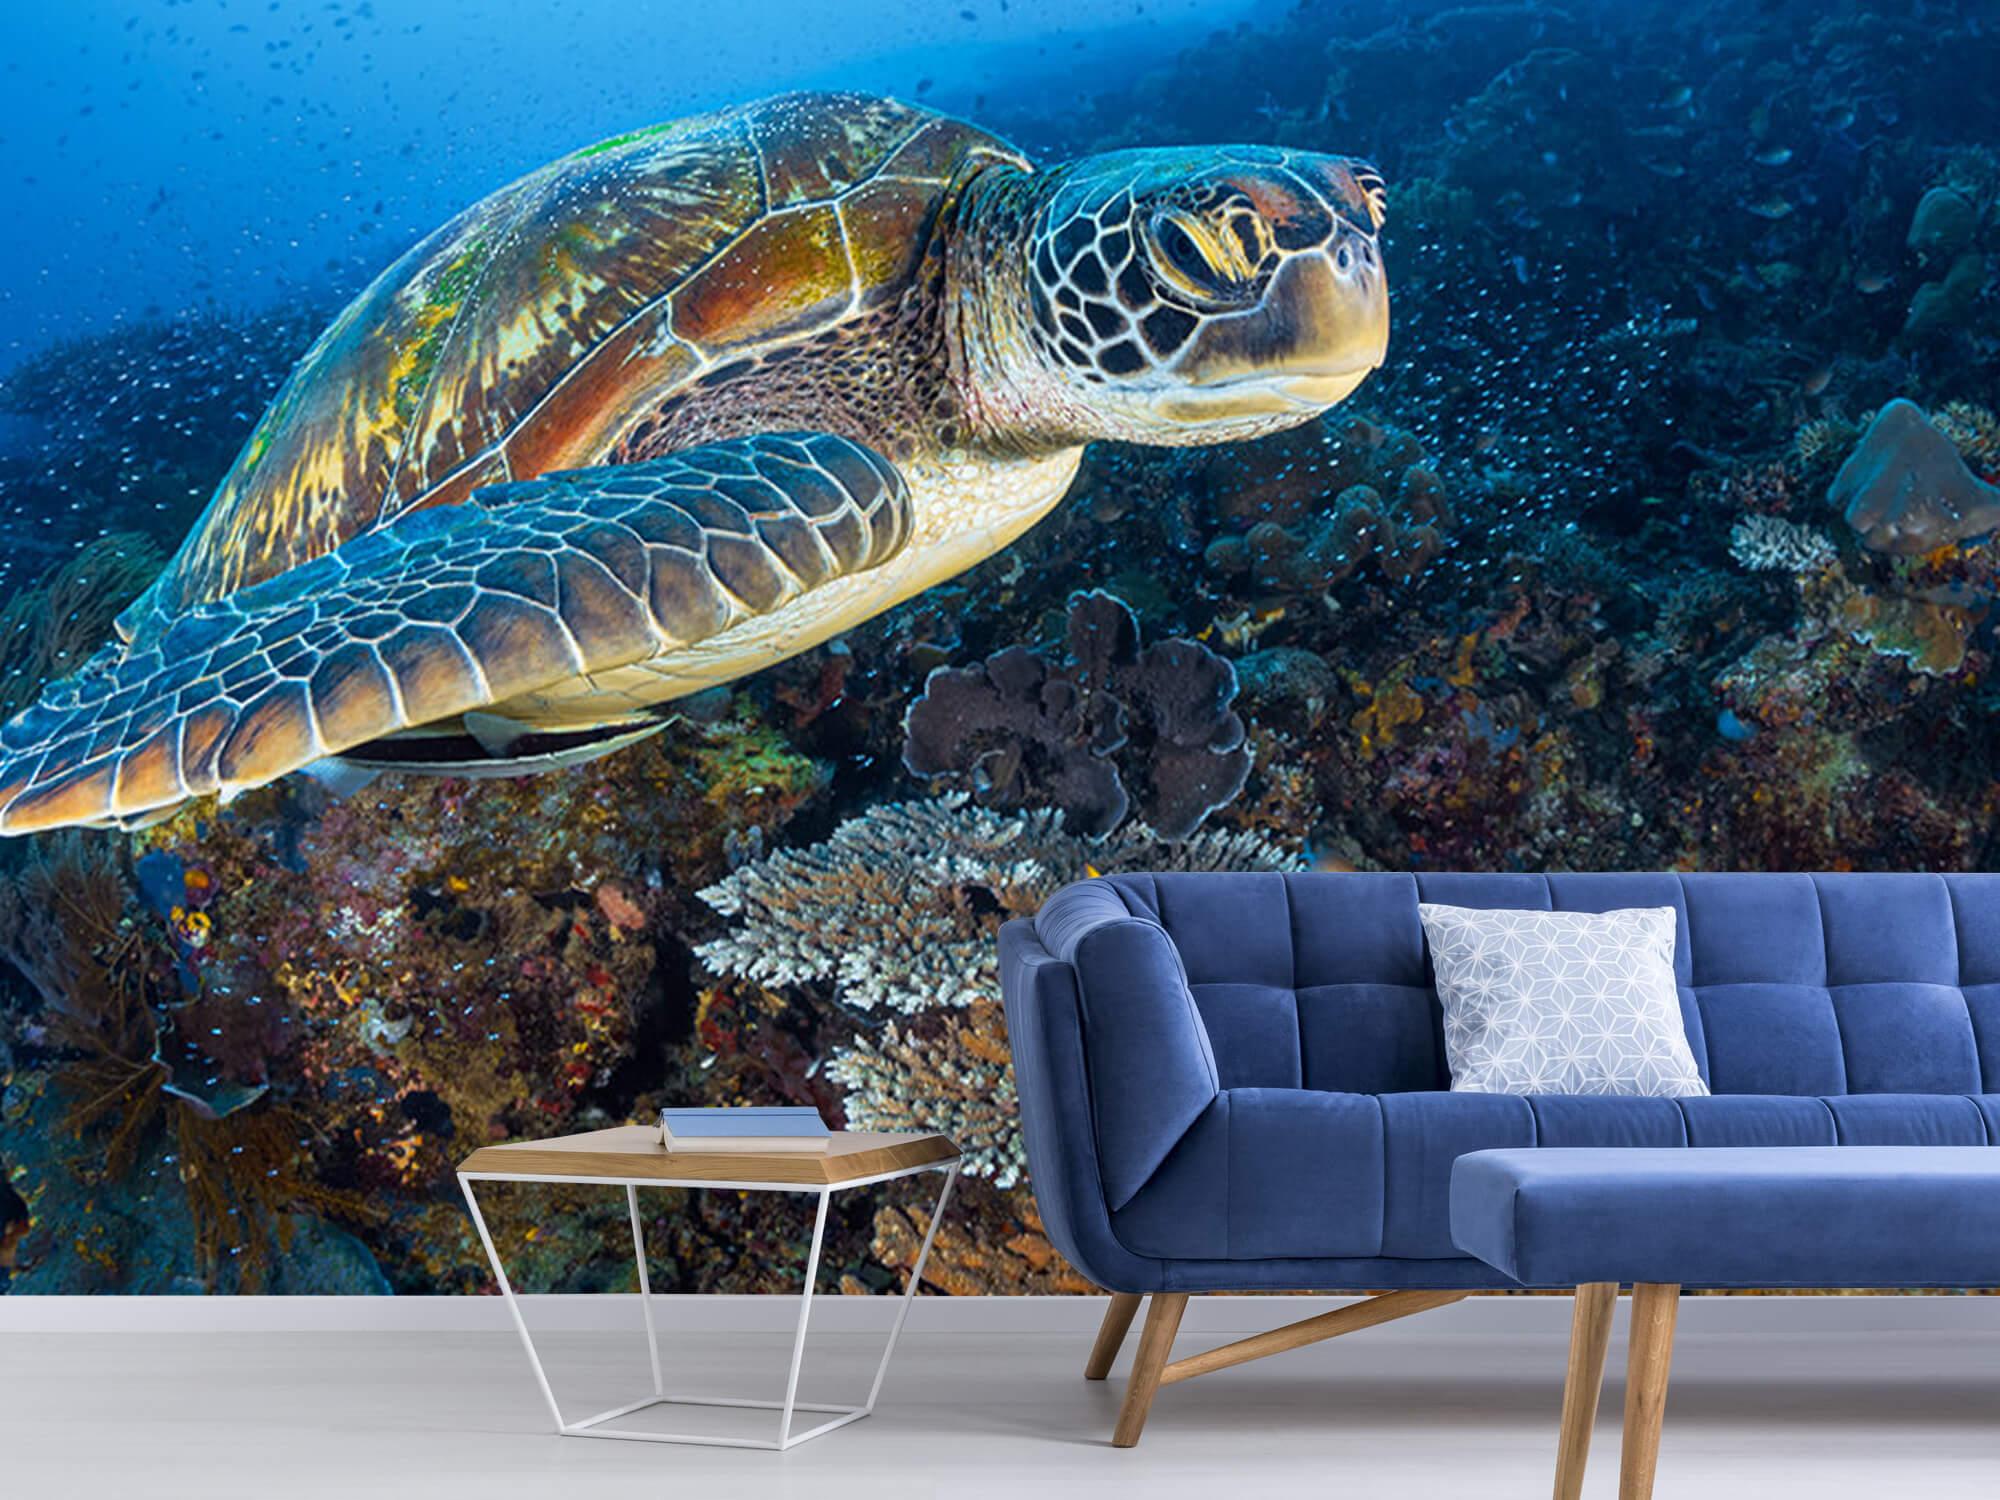 Green sea turtle from Raja Ampat 7